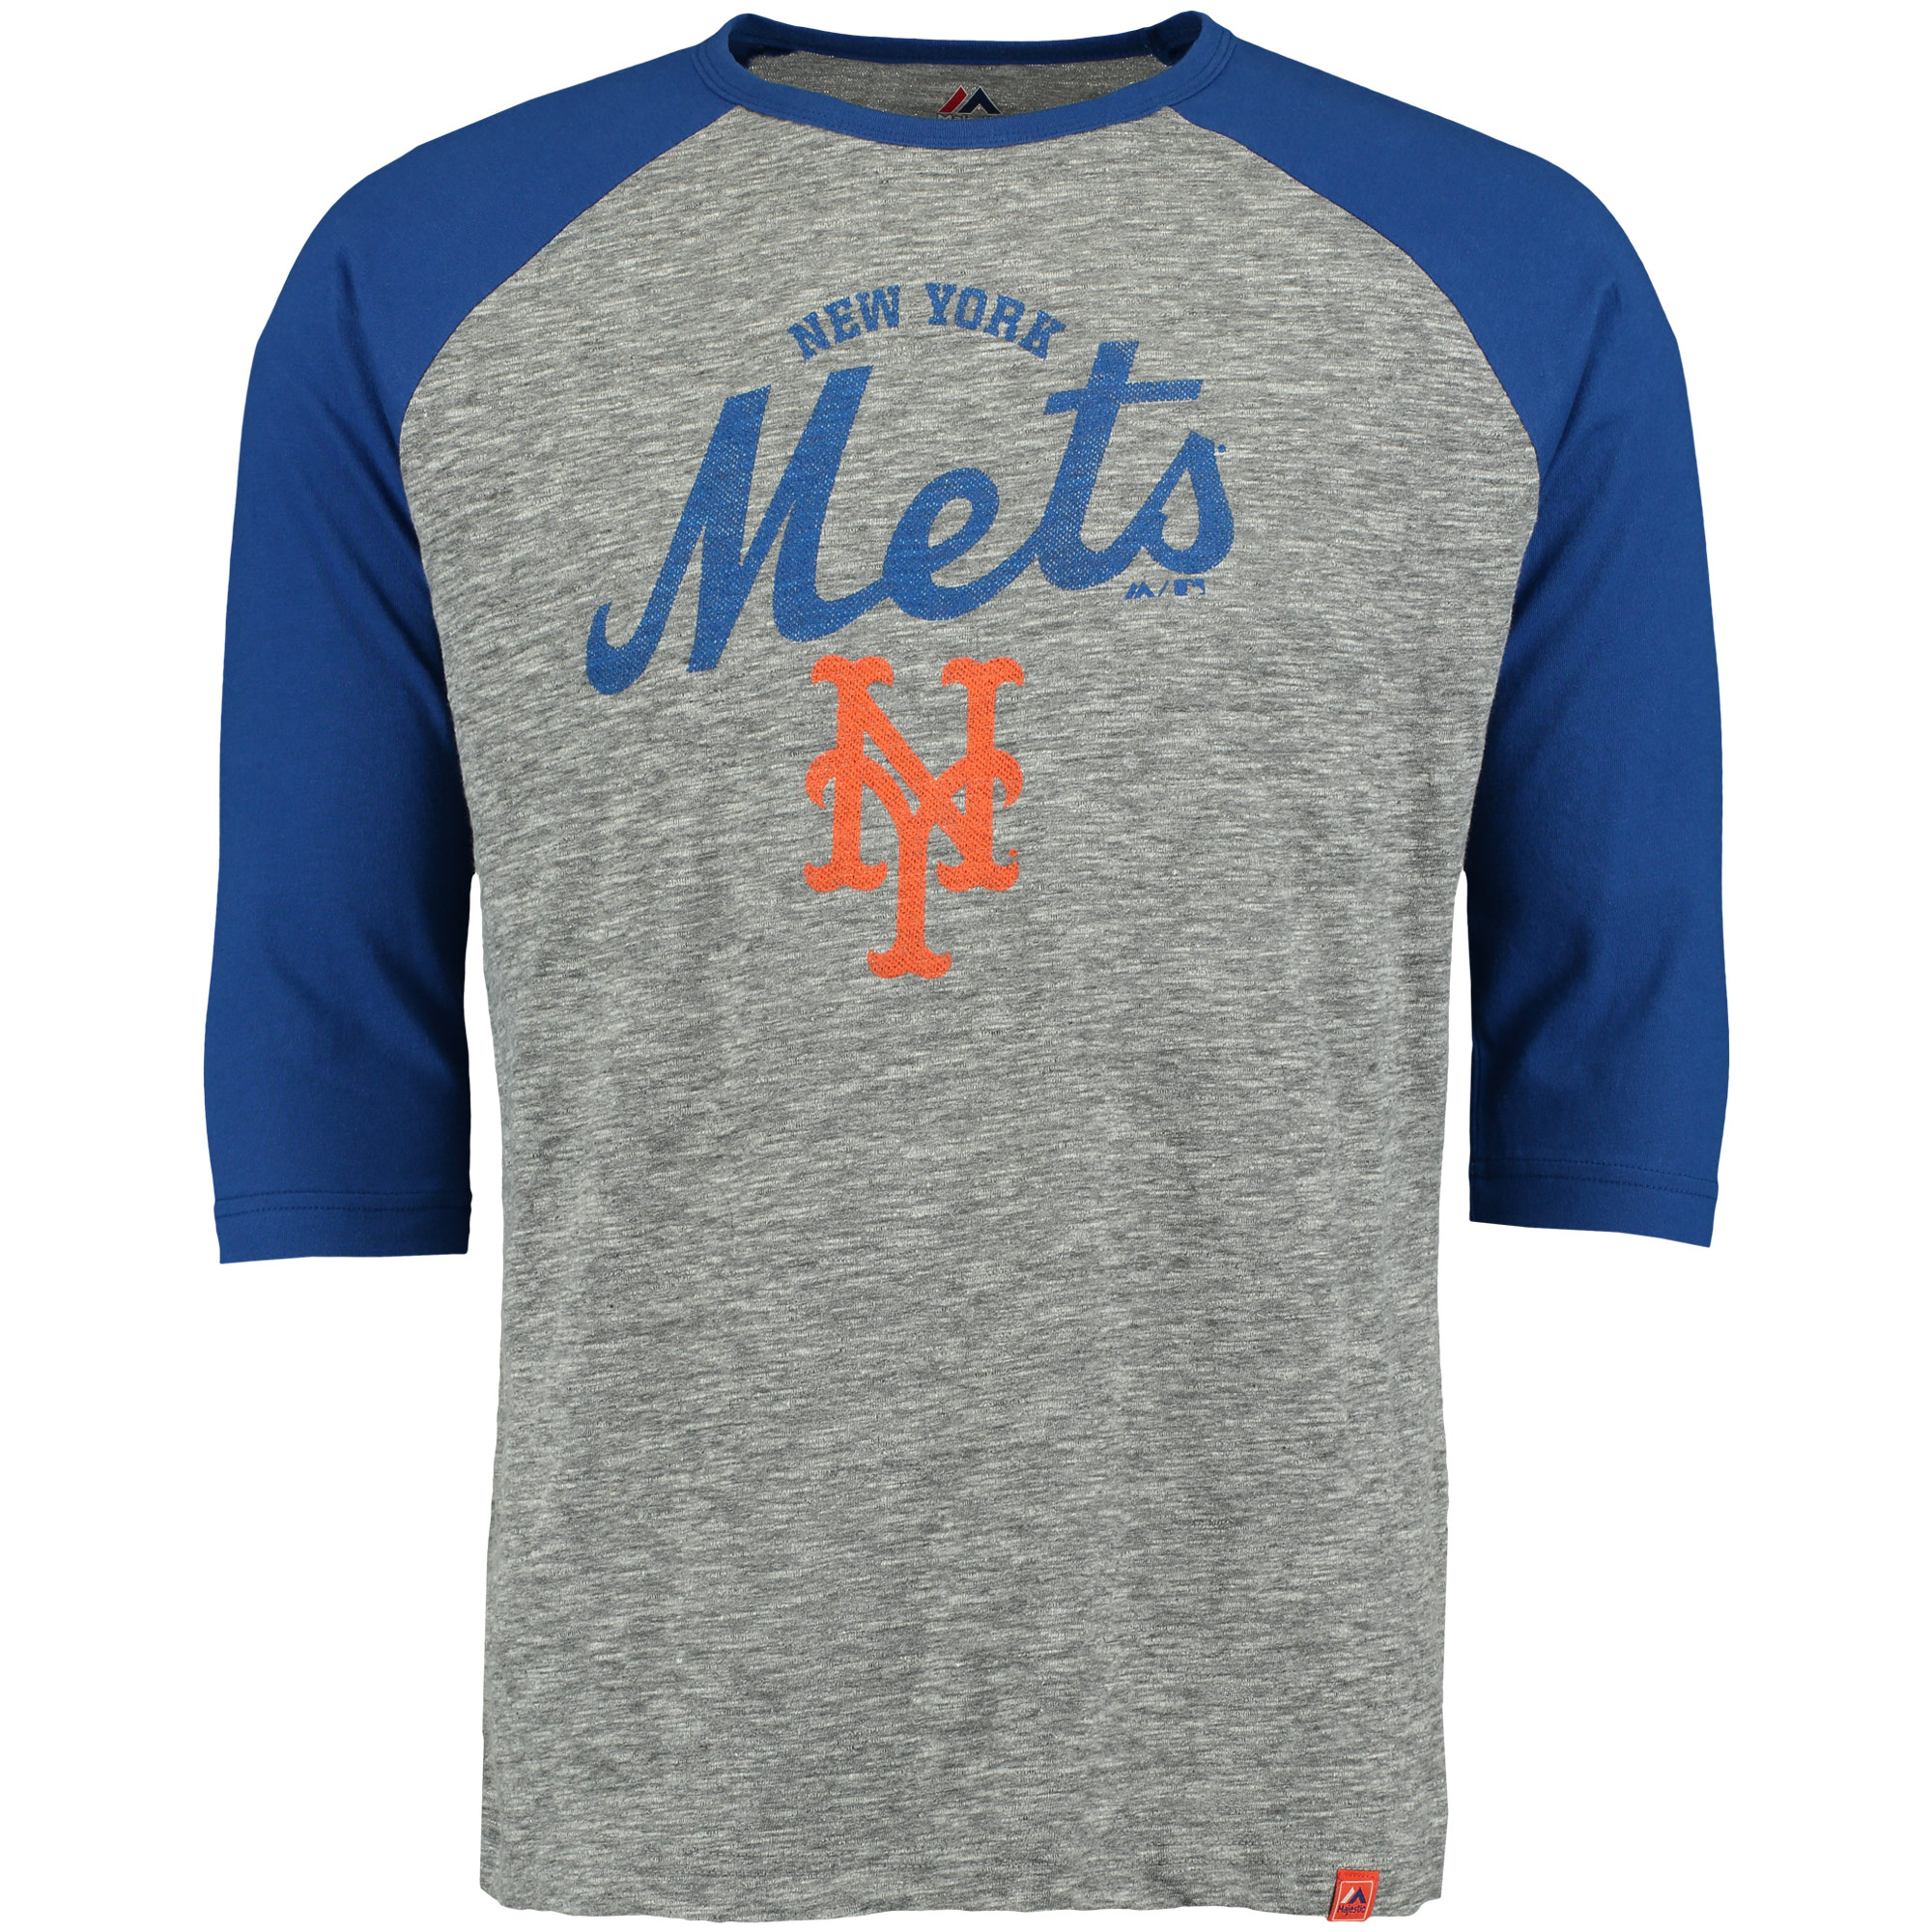 New York Mets Majestic Fast Win Three-Quarter Sleeve Raglan T-Shirt - Gray/Royal